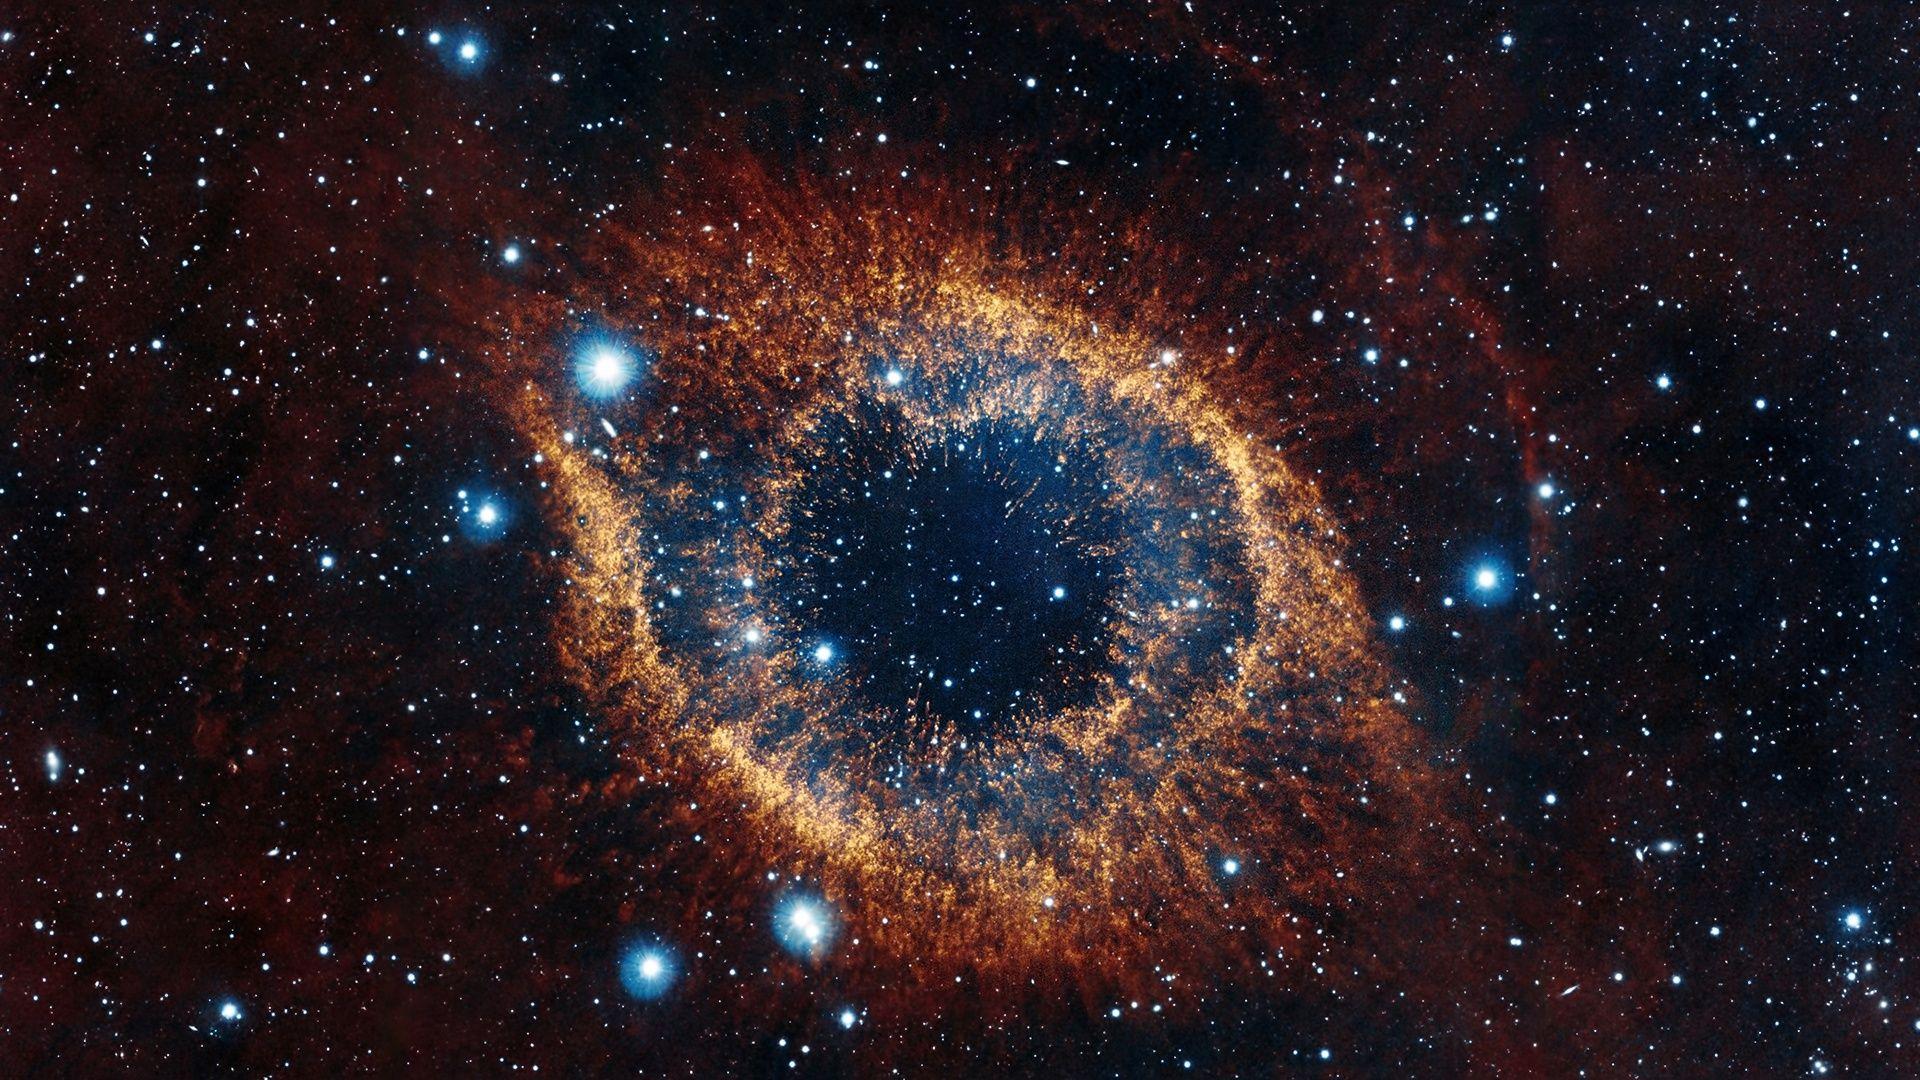 helix-carina-nebula-wallpaper | Arresting | Pinterest | Nebula wallpaper, Helix nebula and ...